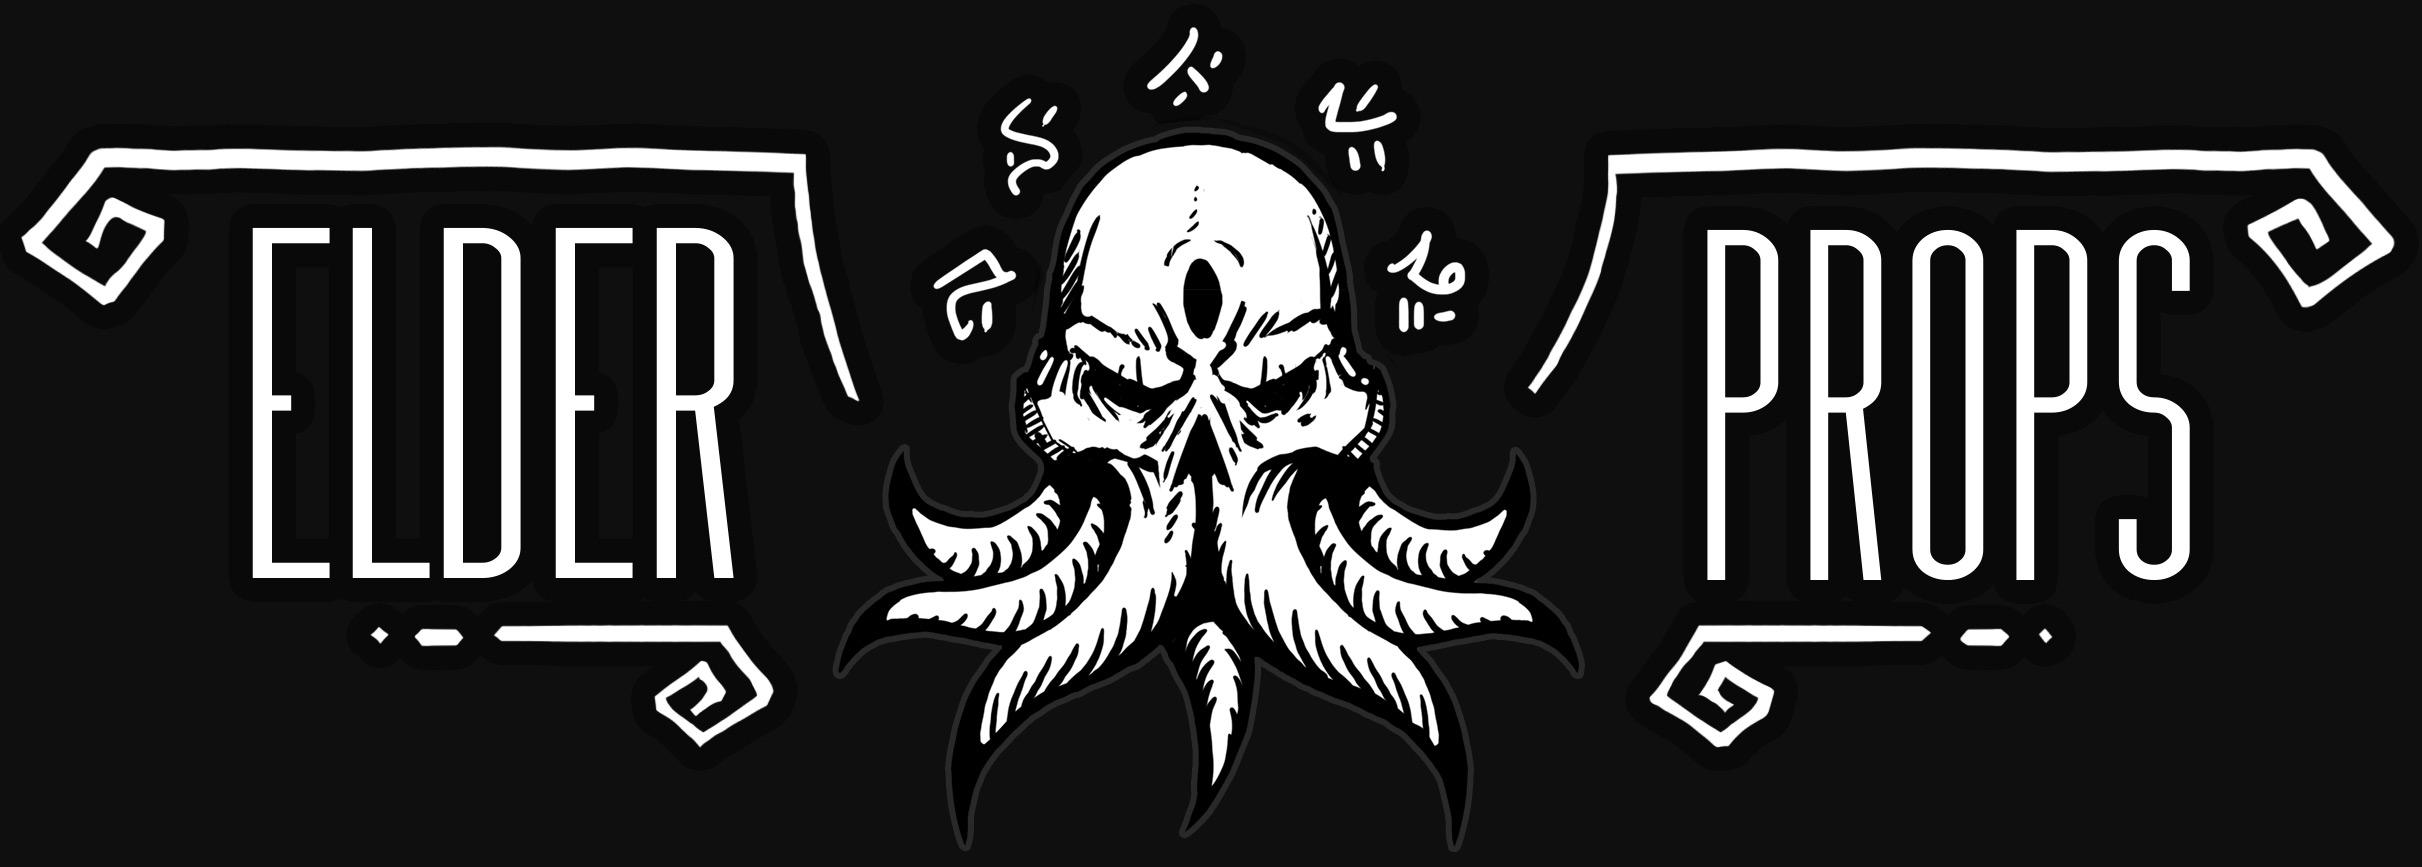 Elder Props - www.elderprops.com • Free EvilDead 2013 ...